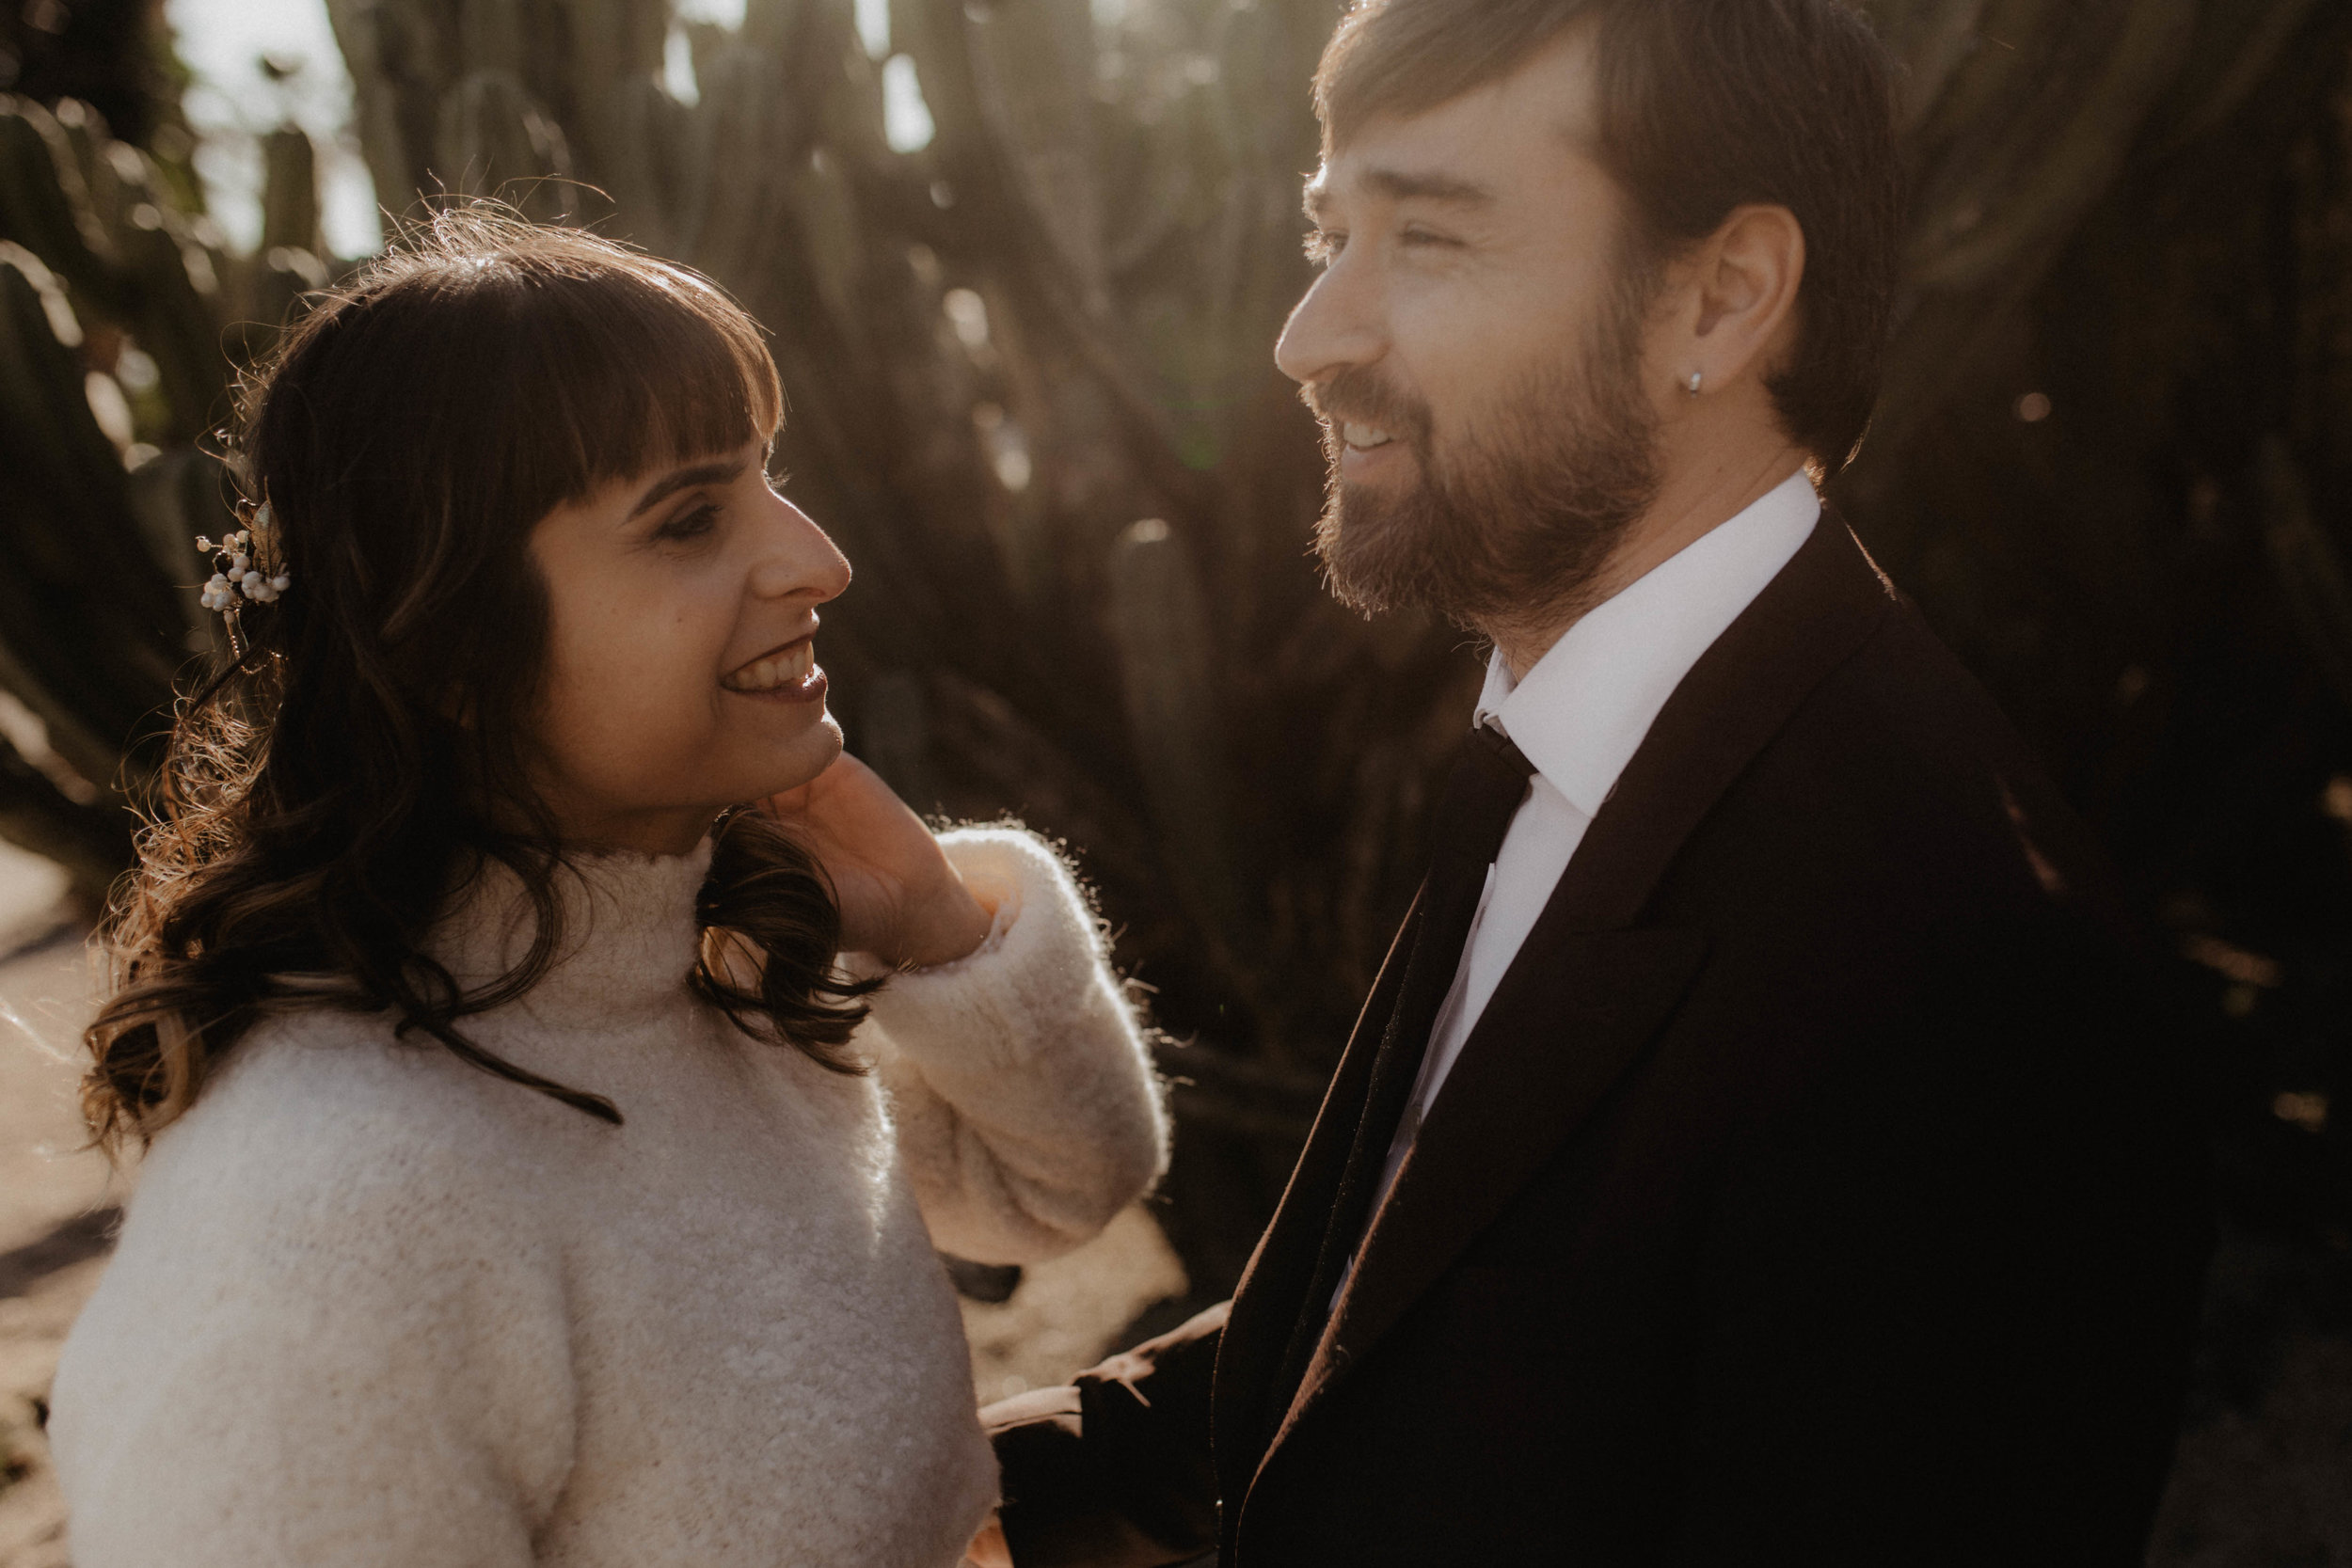 thenortherngirlphotography-photography-weddingphotography-couple-bodasconestilo-bodasenbarcelona-martadavid-295.jpg